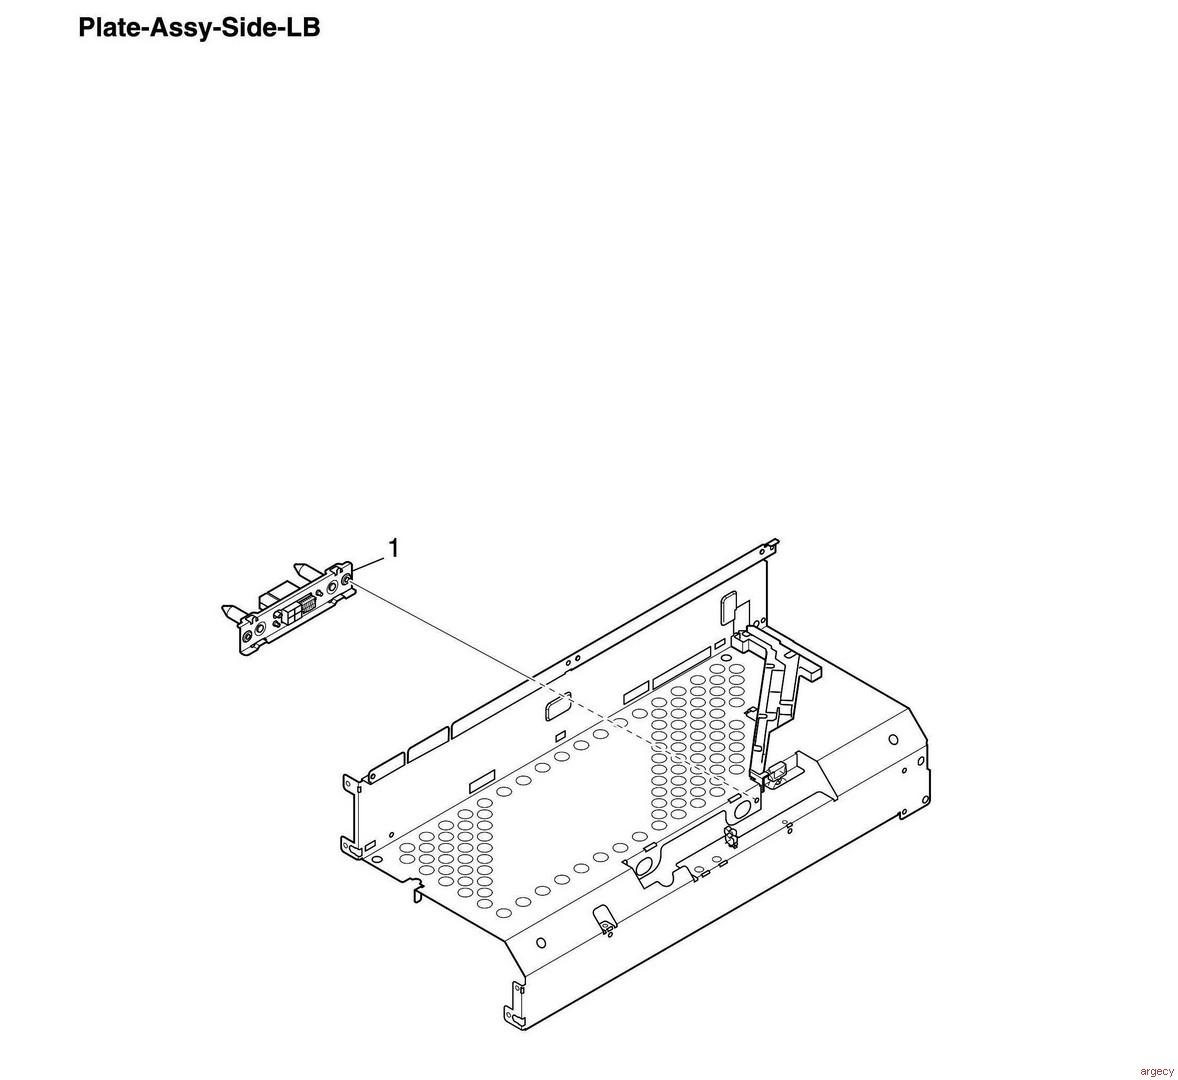 http://www.argecy.com/images/C911_C931_C941_Parts-33_cr.jpg